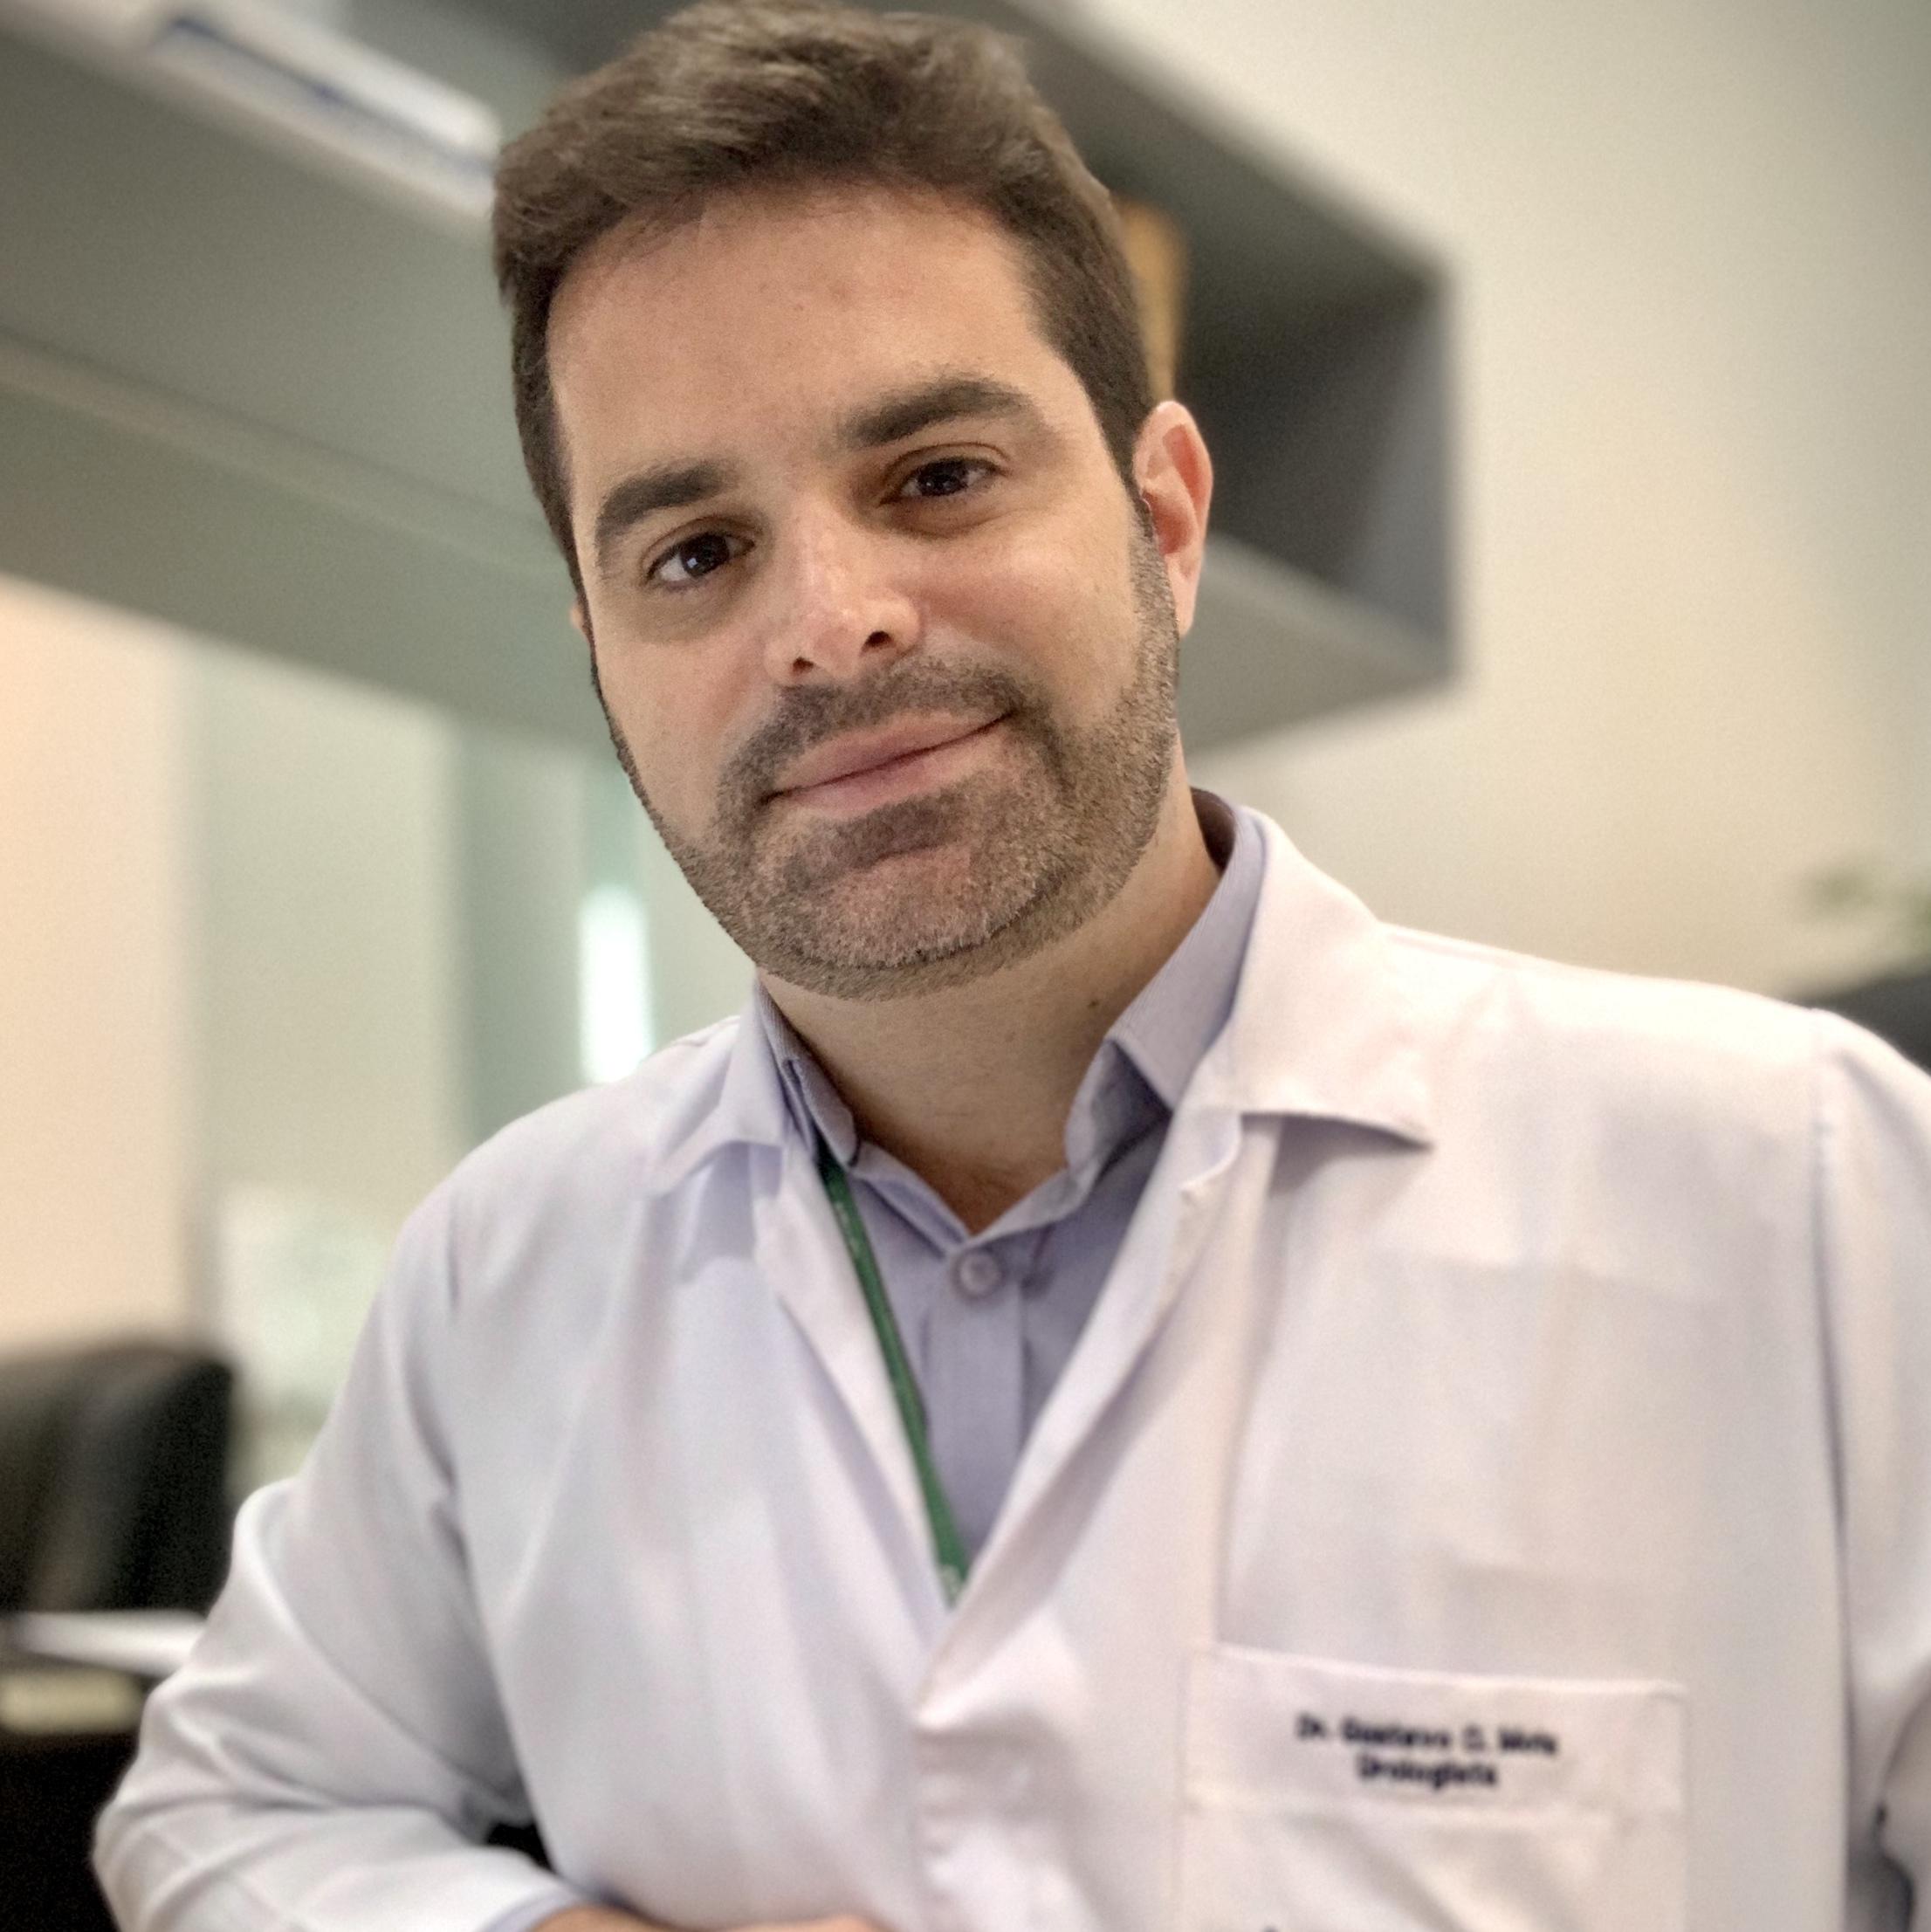 Gustavo de Oliveira Mota